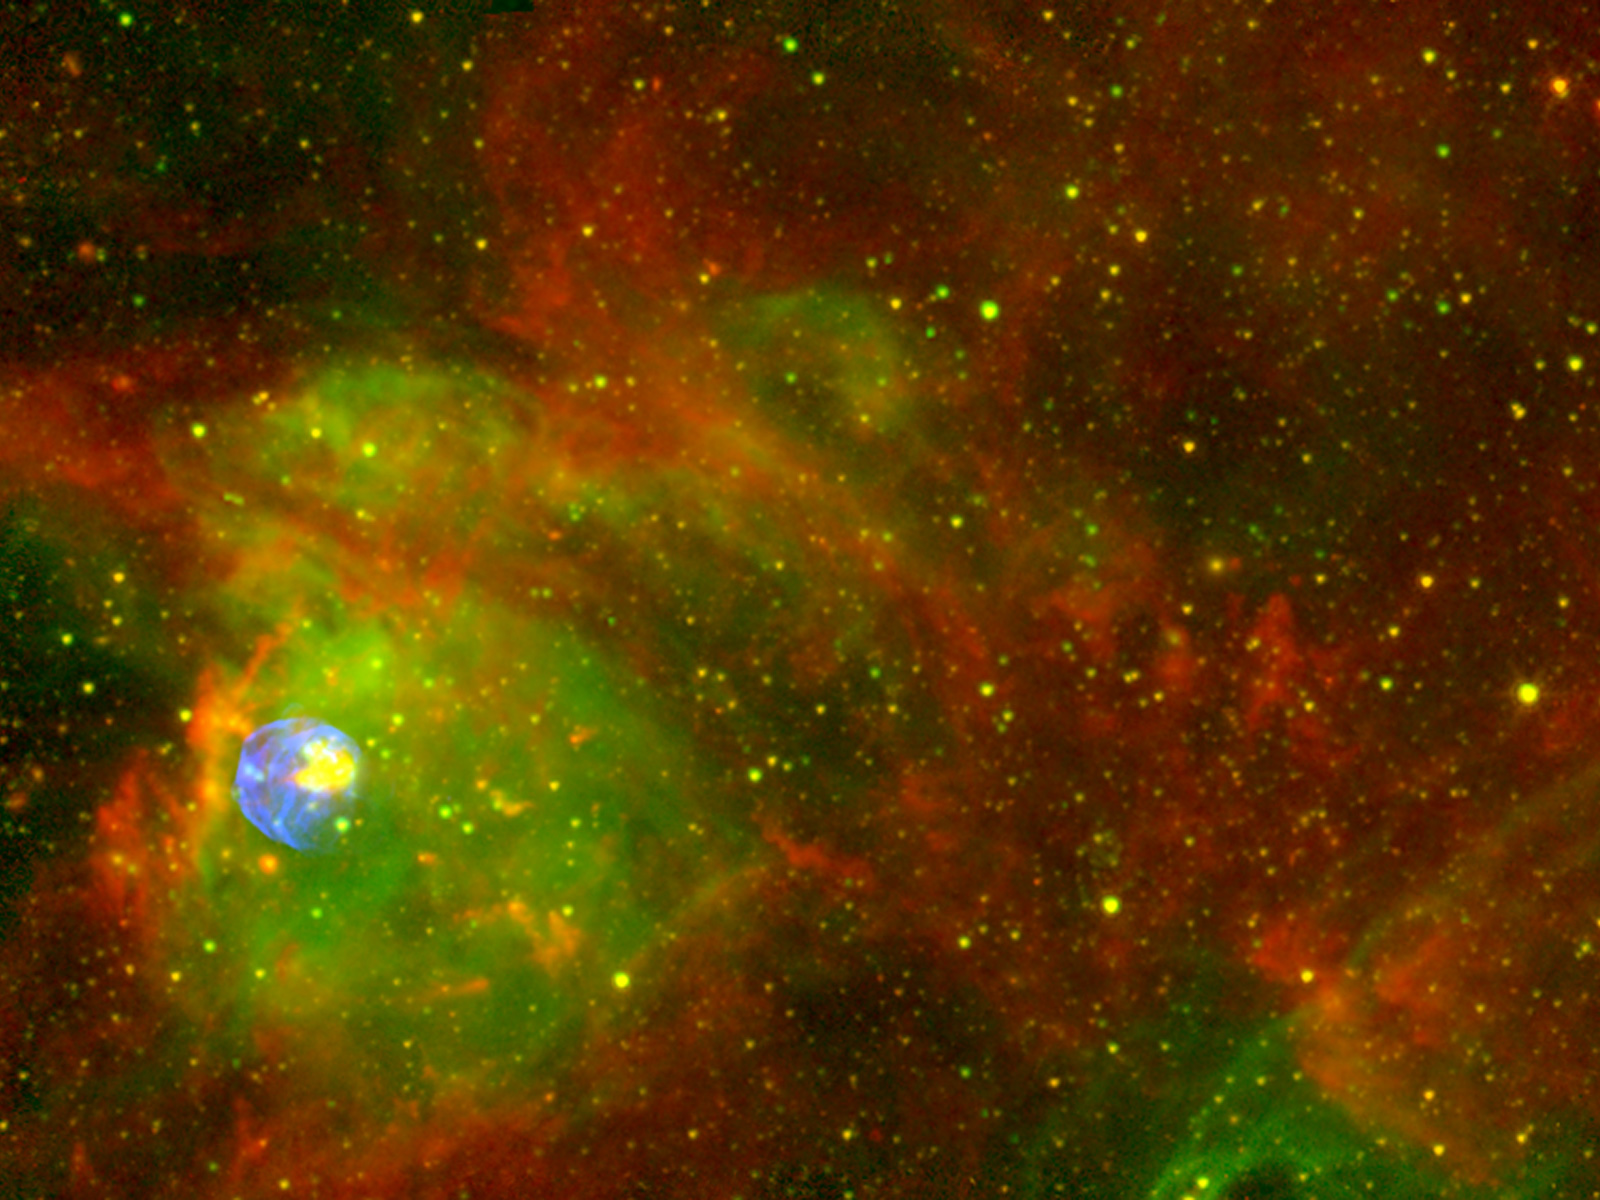 Wallpaper Hubble Site | Free Download Wallpaper | DaWallpaperz